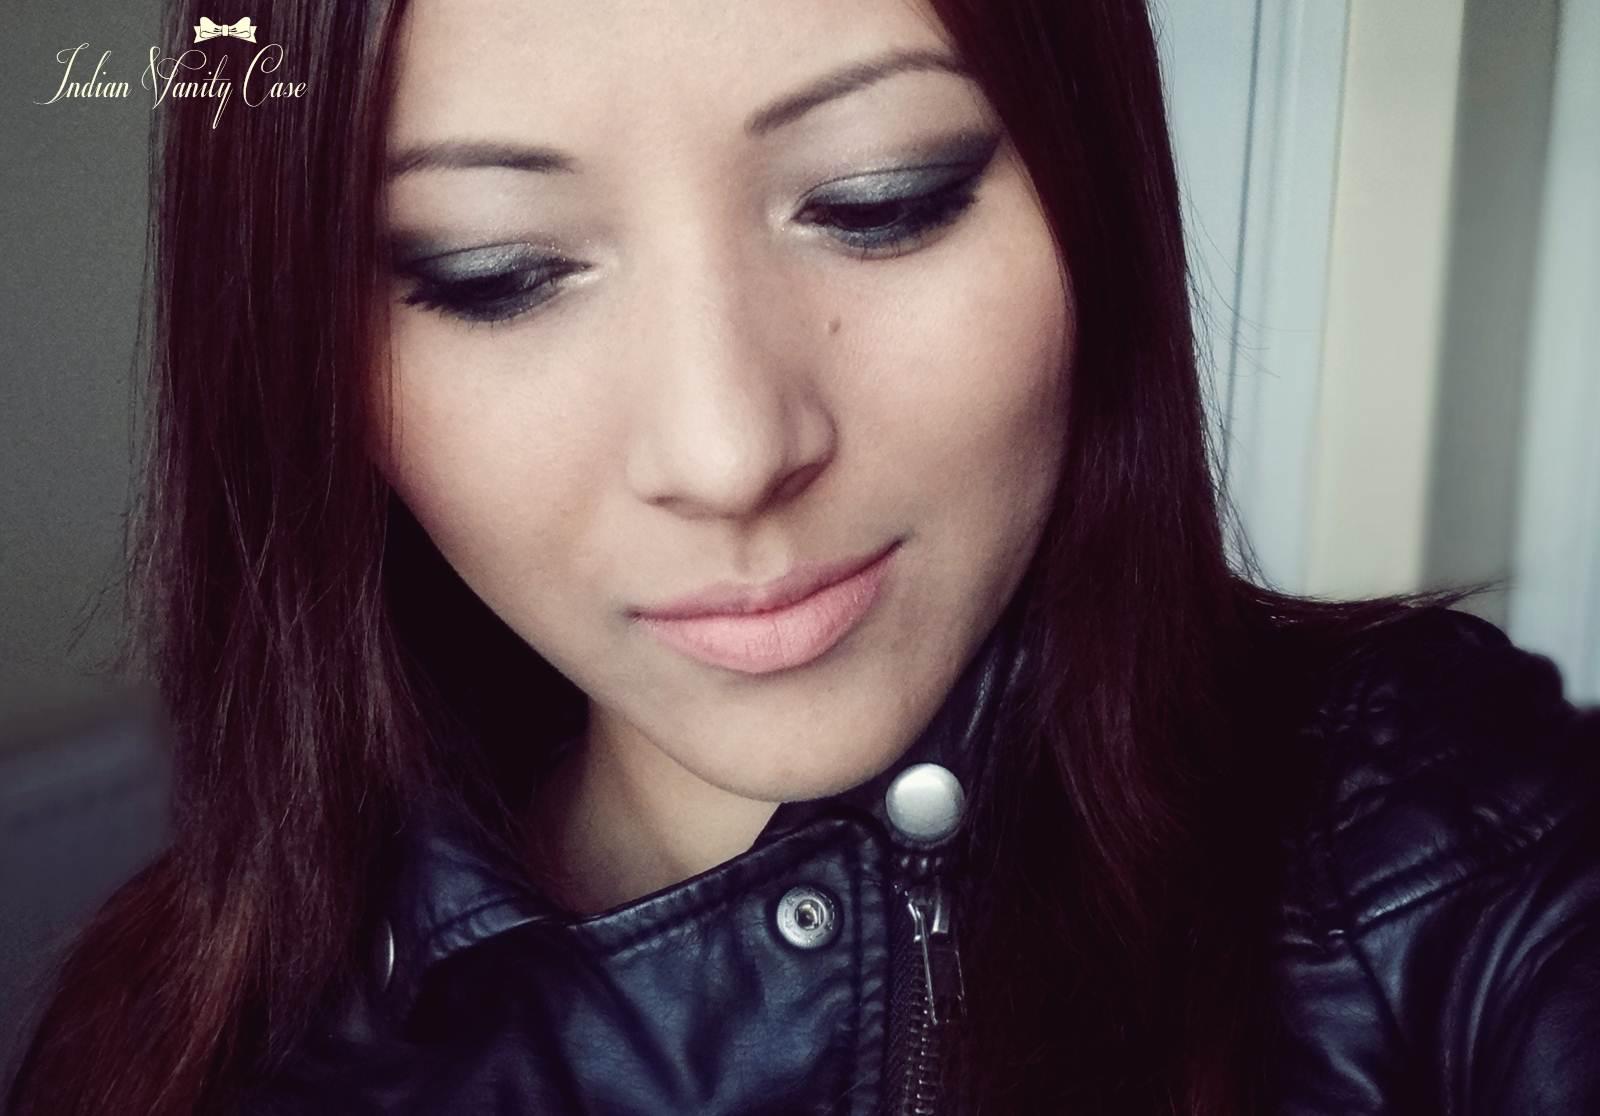 http://4.bp.blogspot.com/-hmebPLutmrc/UHwK26OAidI/AAAAAAAAMyQ/tpsfQArKiOg/s1600/leona-lewis-trouble-makeup.jpg